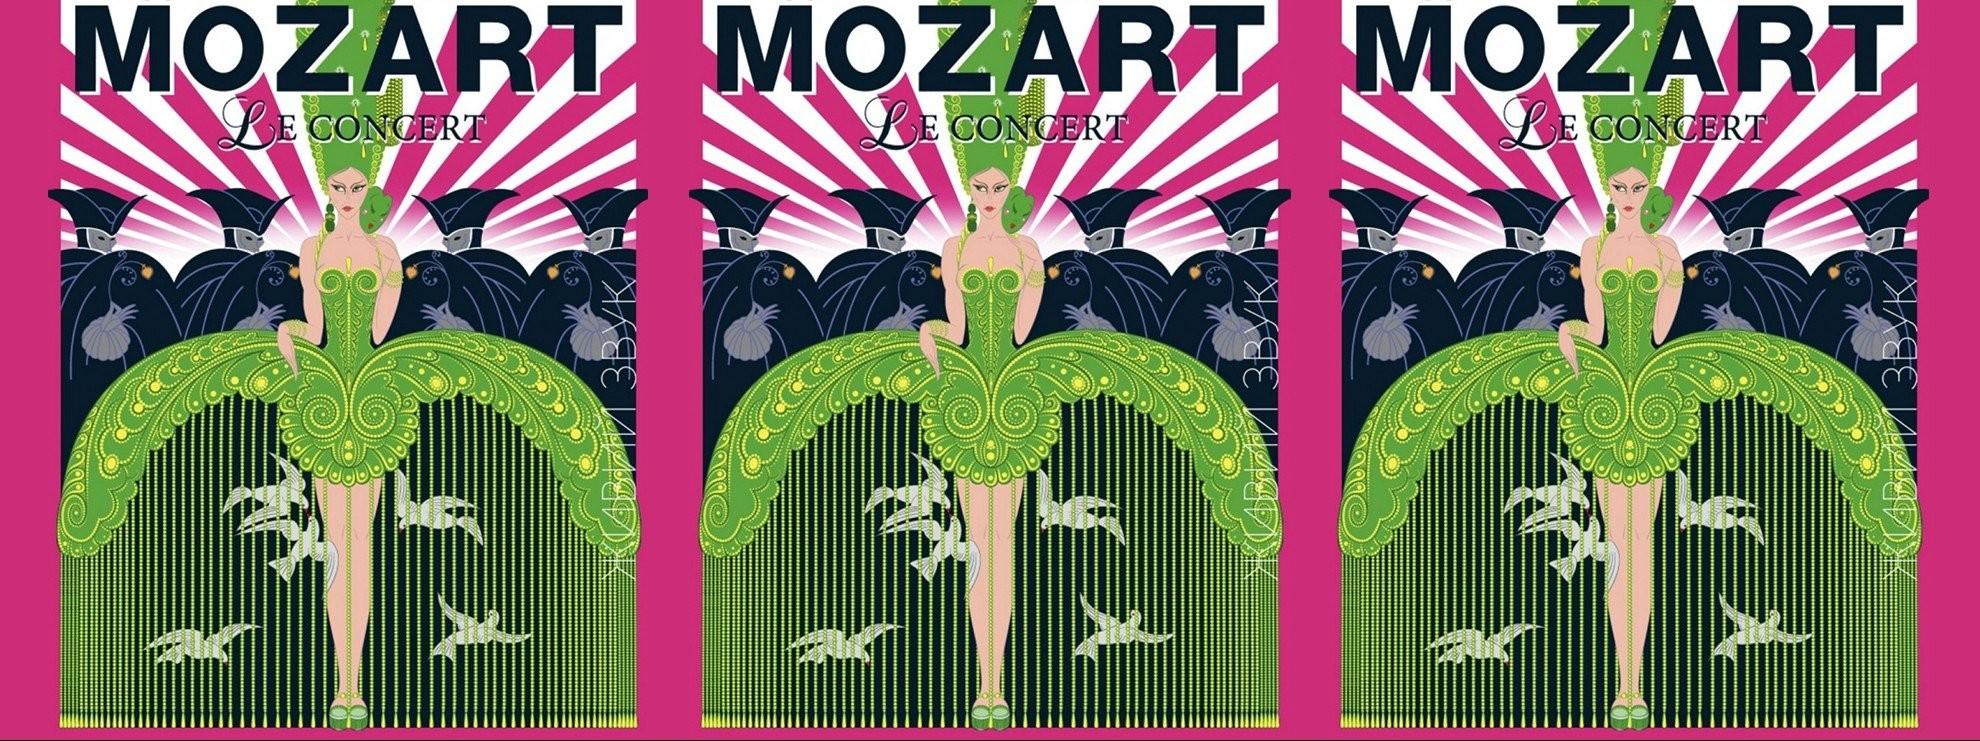 подія Rock Mozart Le Concert (Рок Моцарт Ле Концерт)